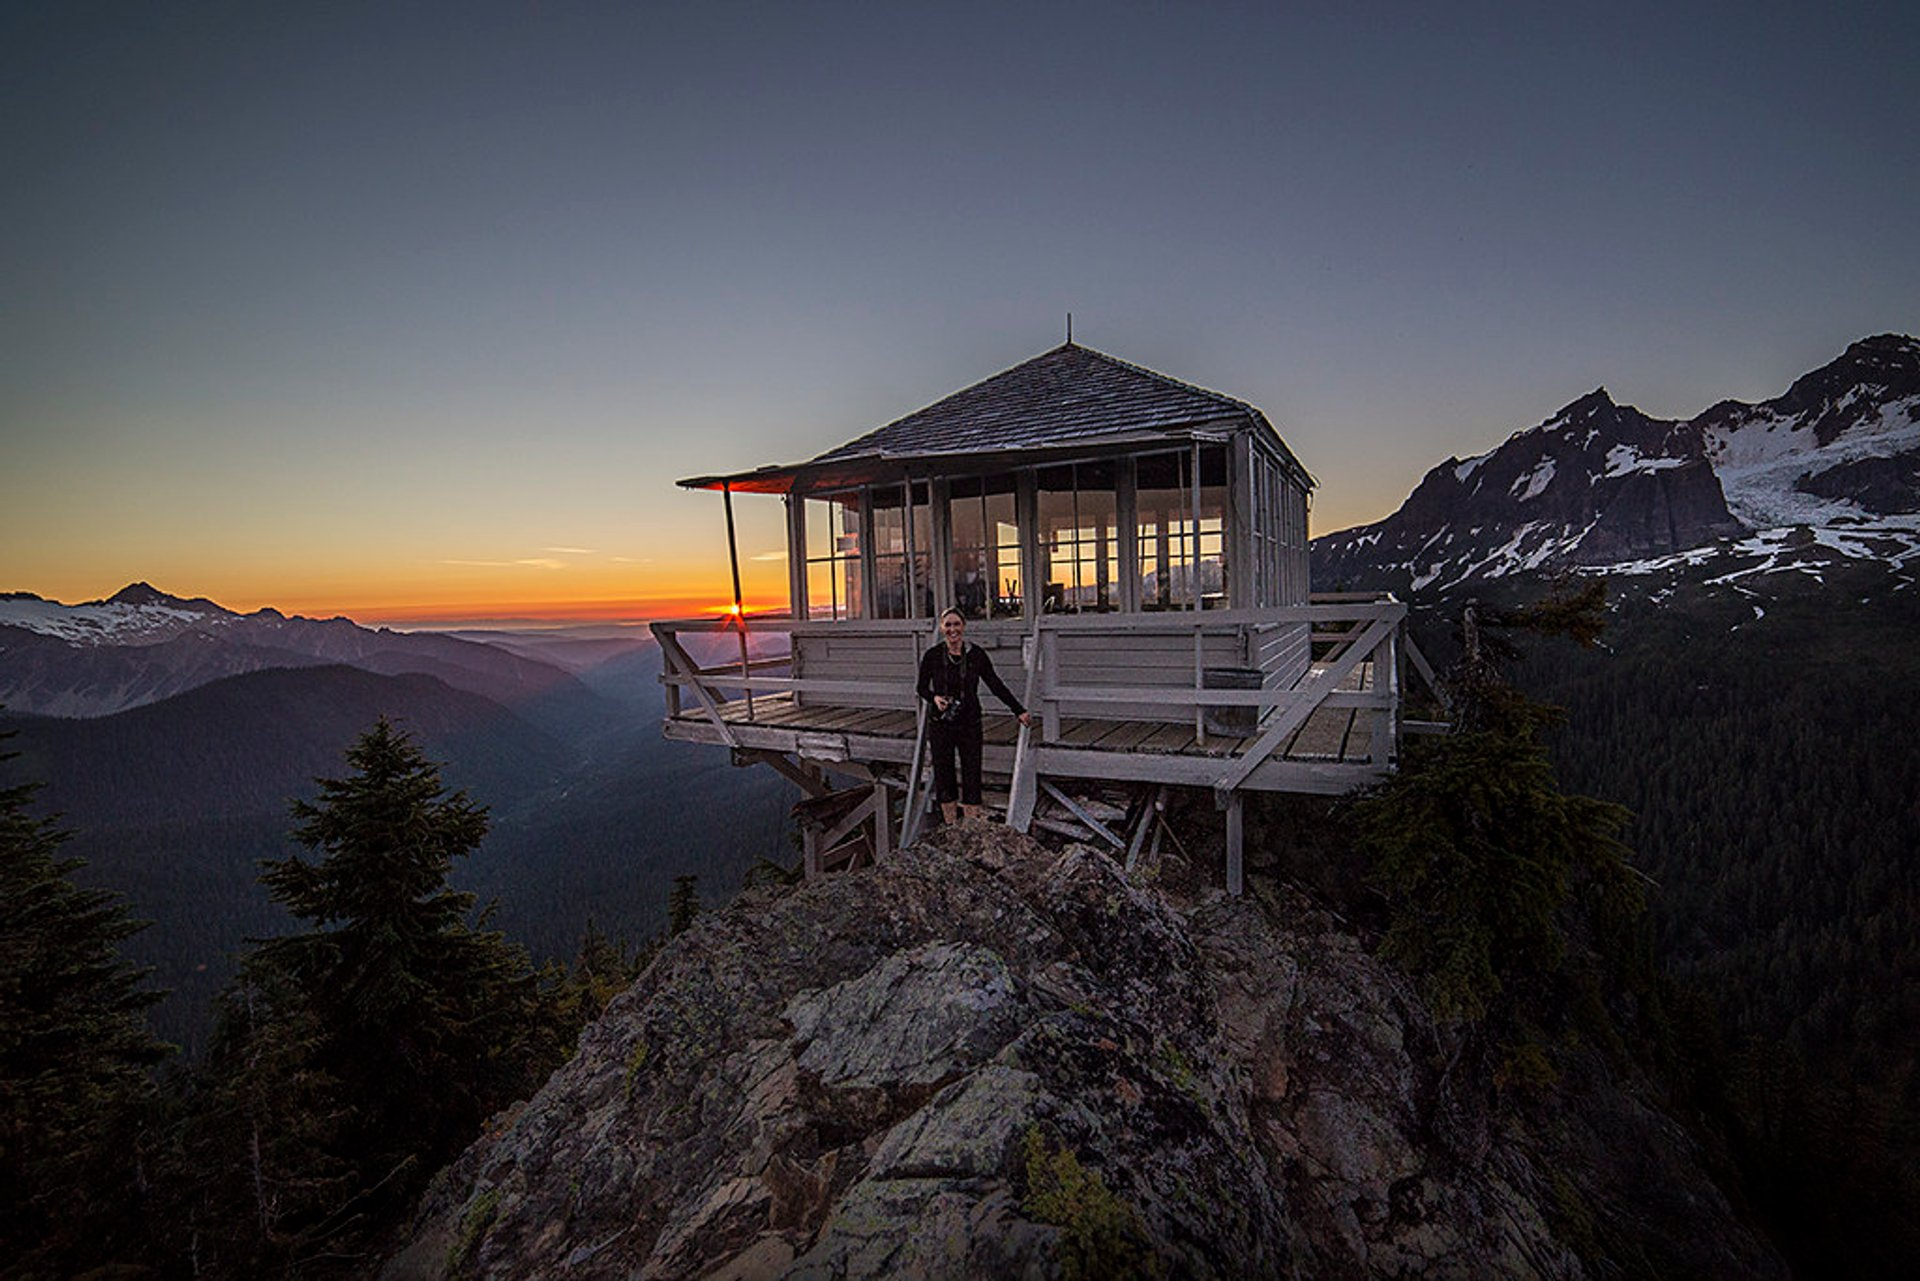 Park Butte Lookout in Washington 2019 - Best Time